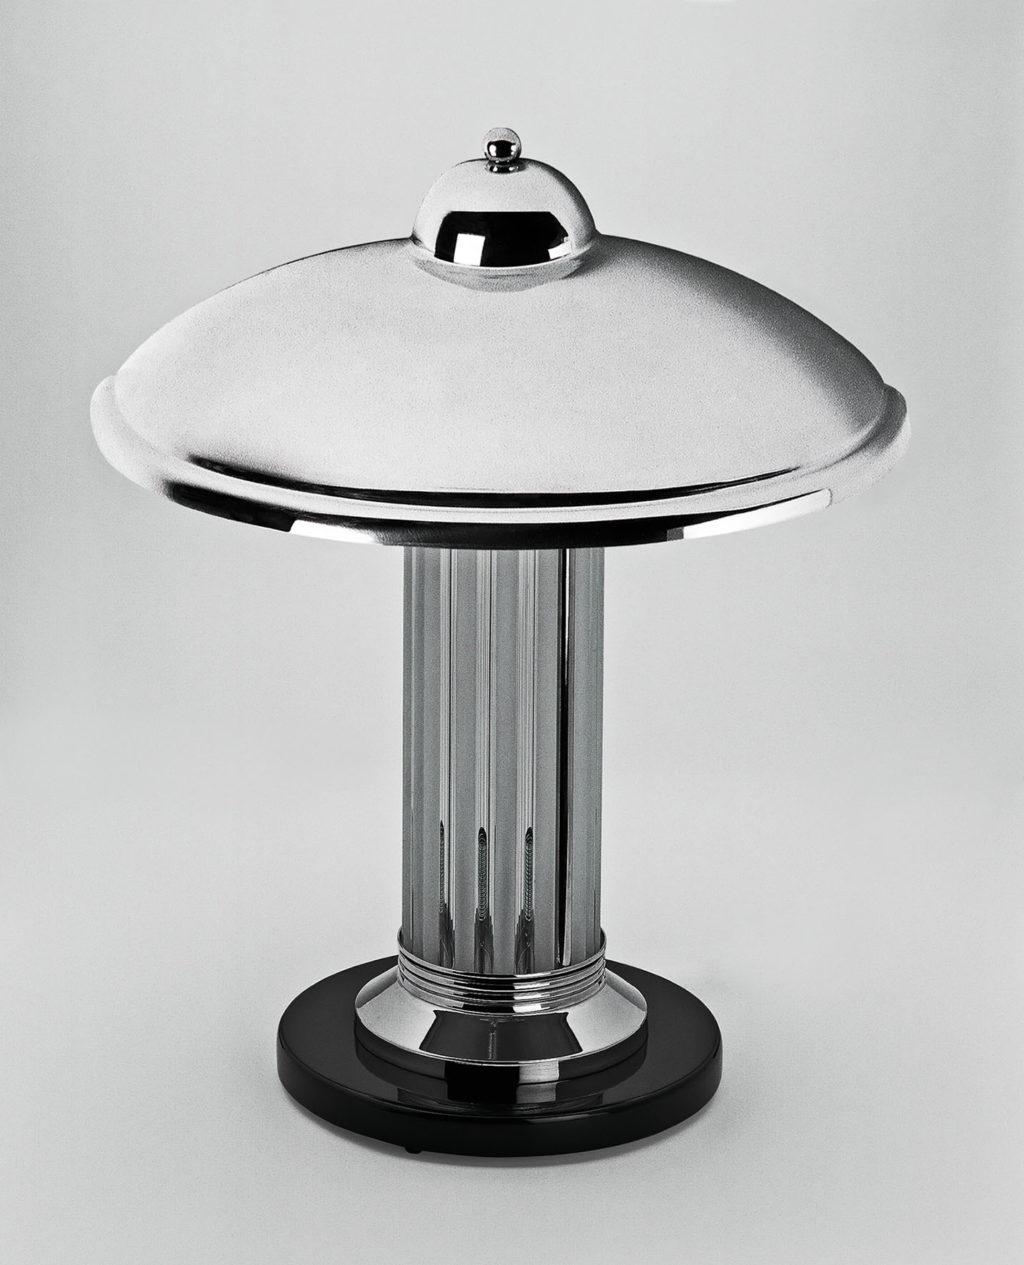 small art deco table lamp limoges original antique furniture. Black Bedroom Furniture Sets. Home Design Ideas